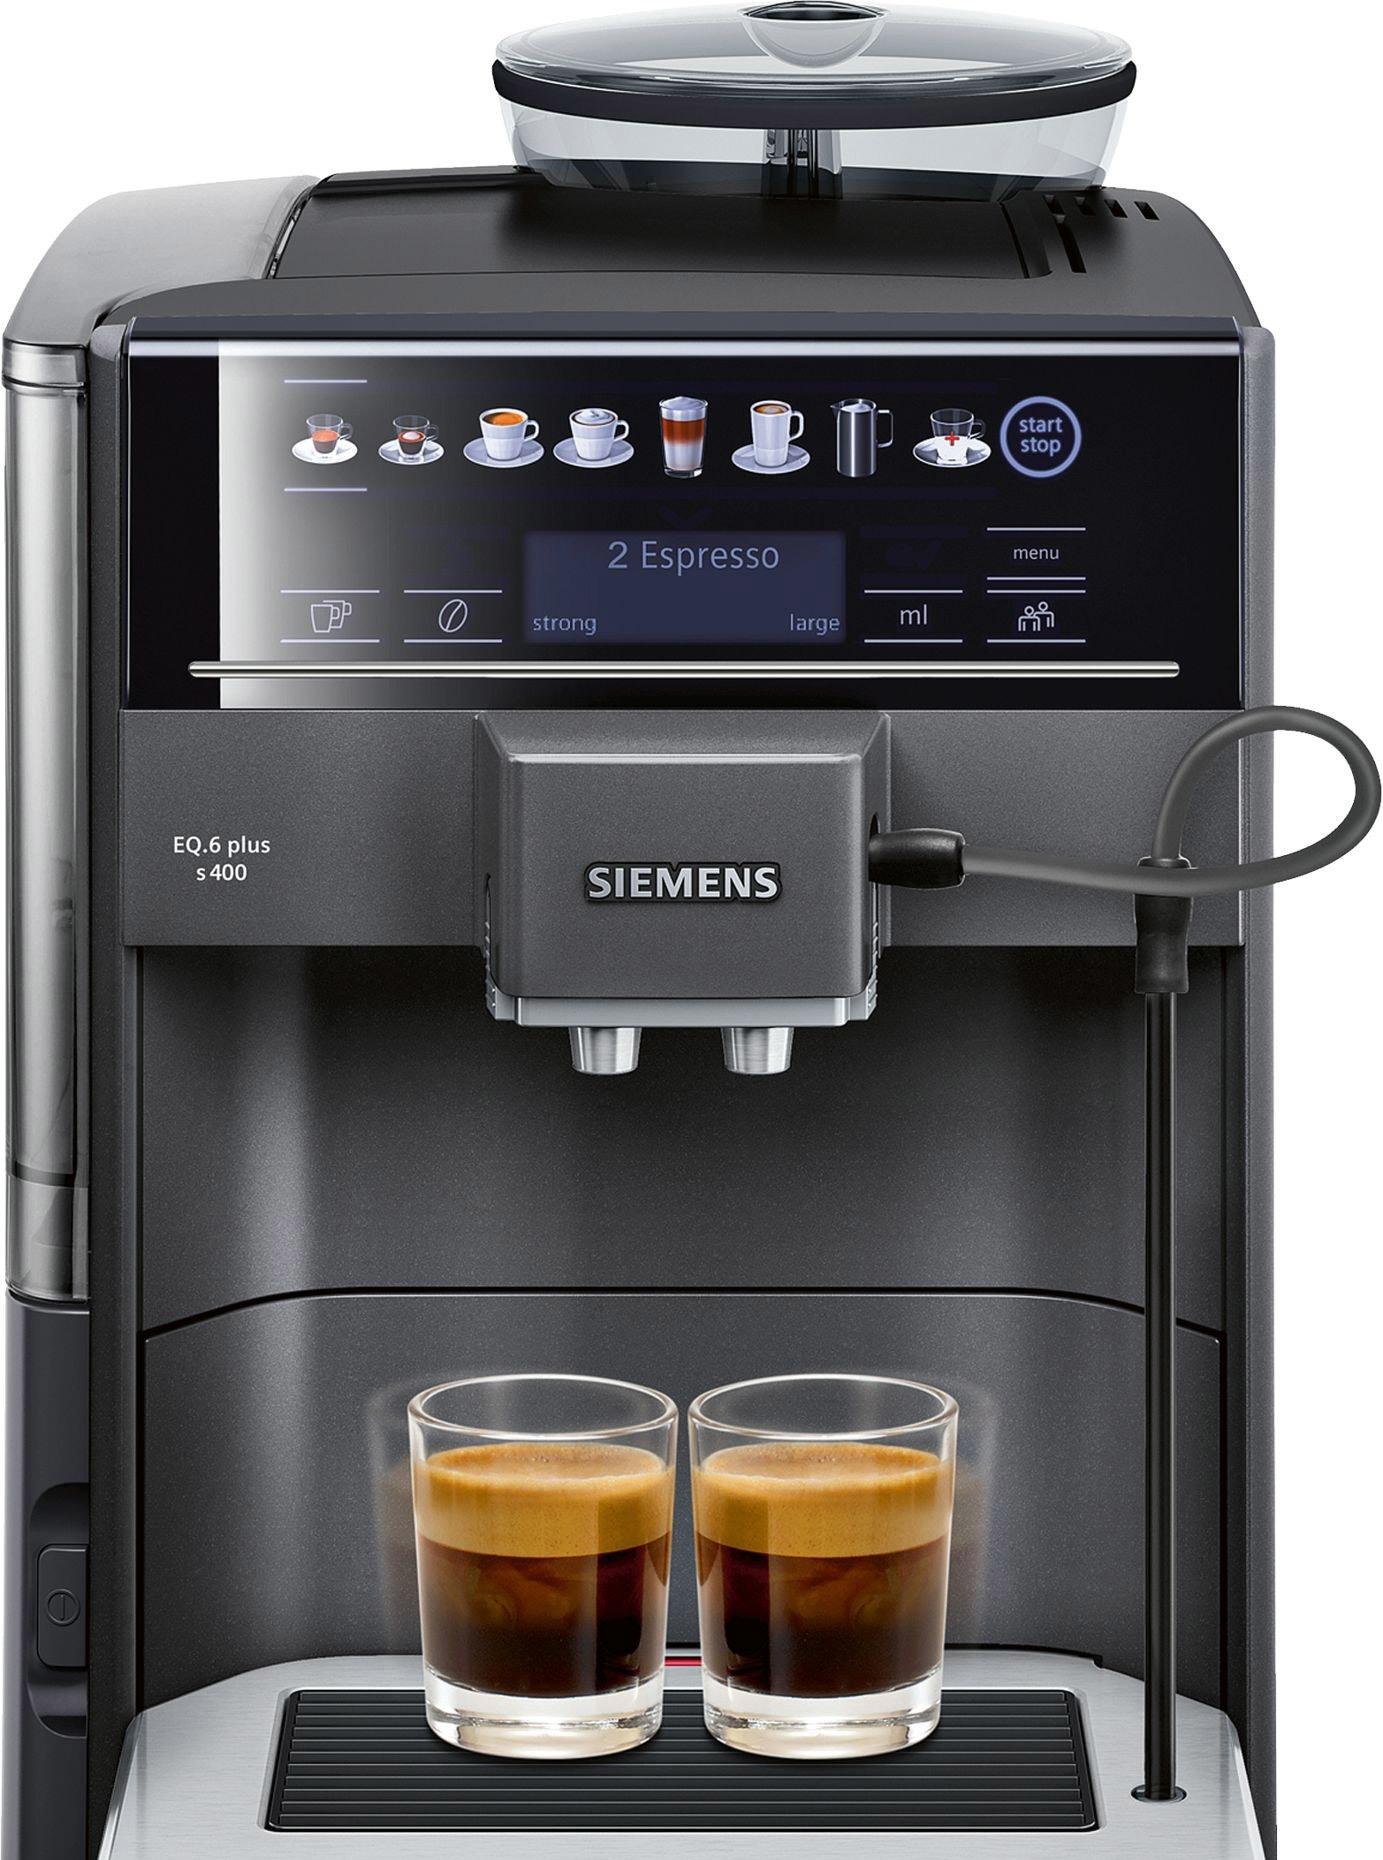 Эспрессо кофемашина Siemens EQ.6 plus s400 TE654319RW